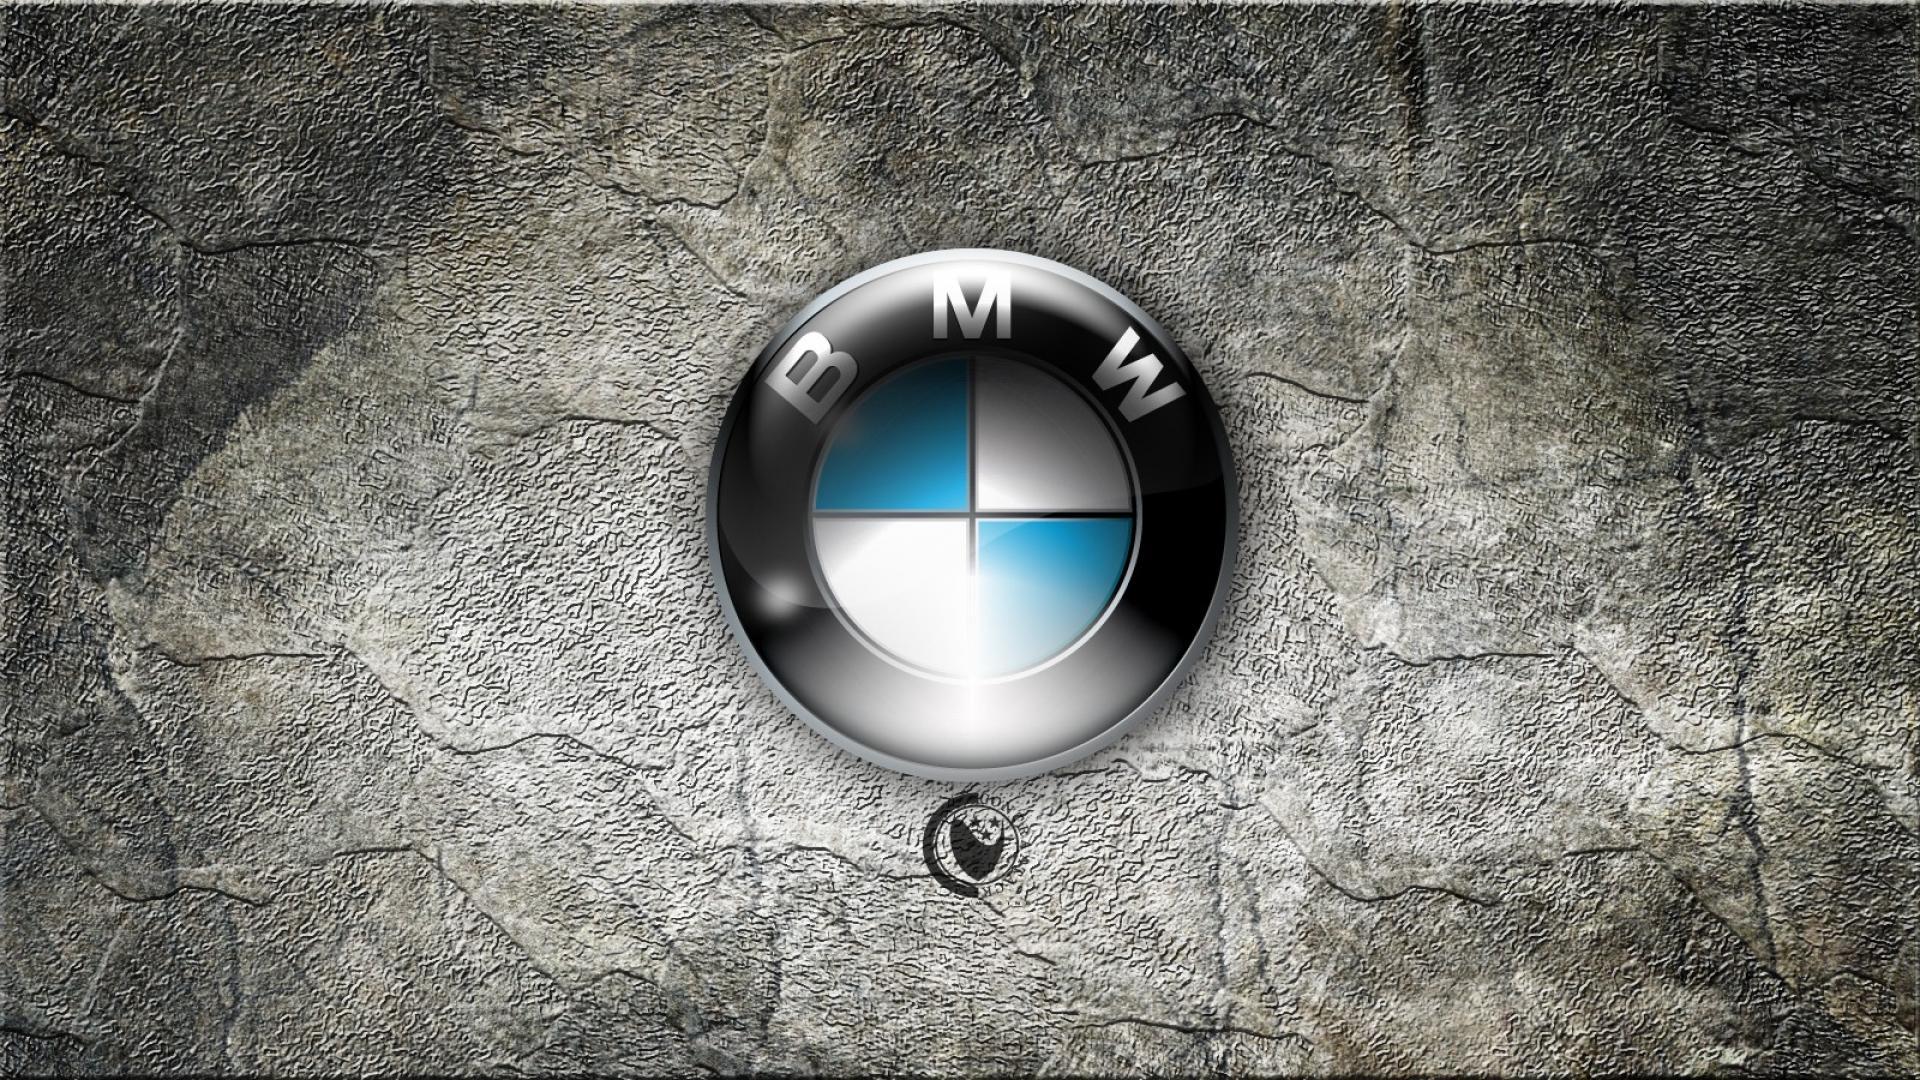 BMW Car Brand Logo HD Wallpapers 1920x1080 Brand Logo Wallpapers 1920x1080